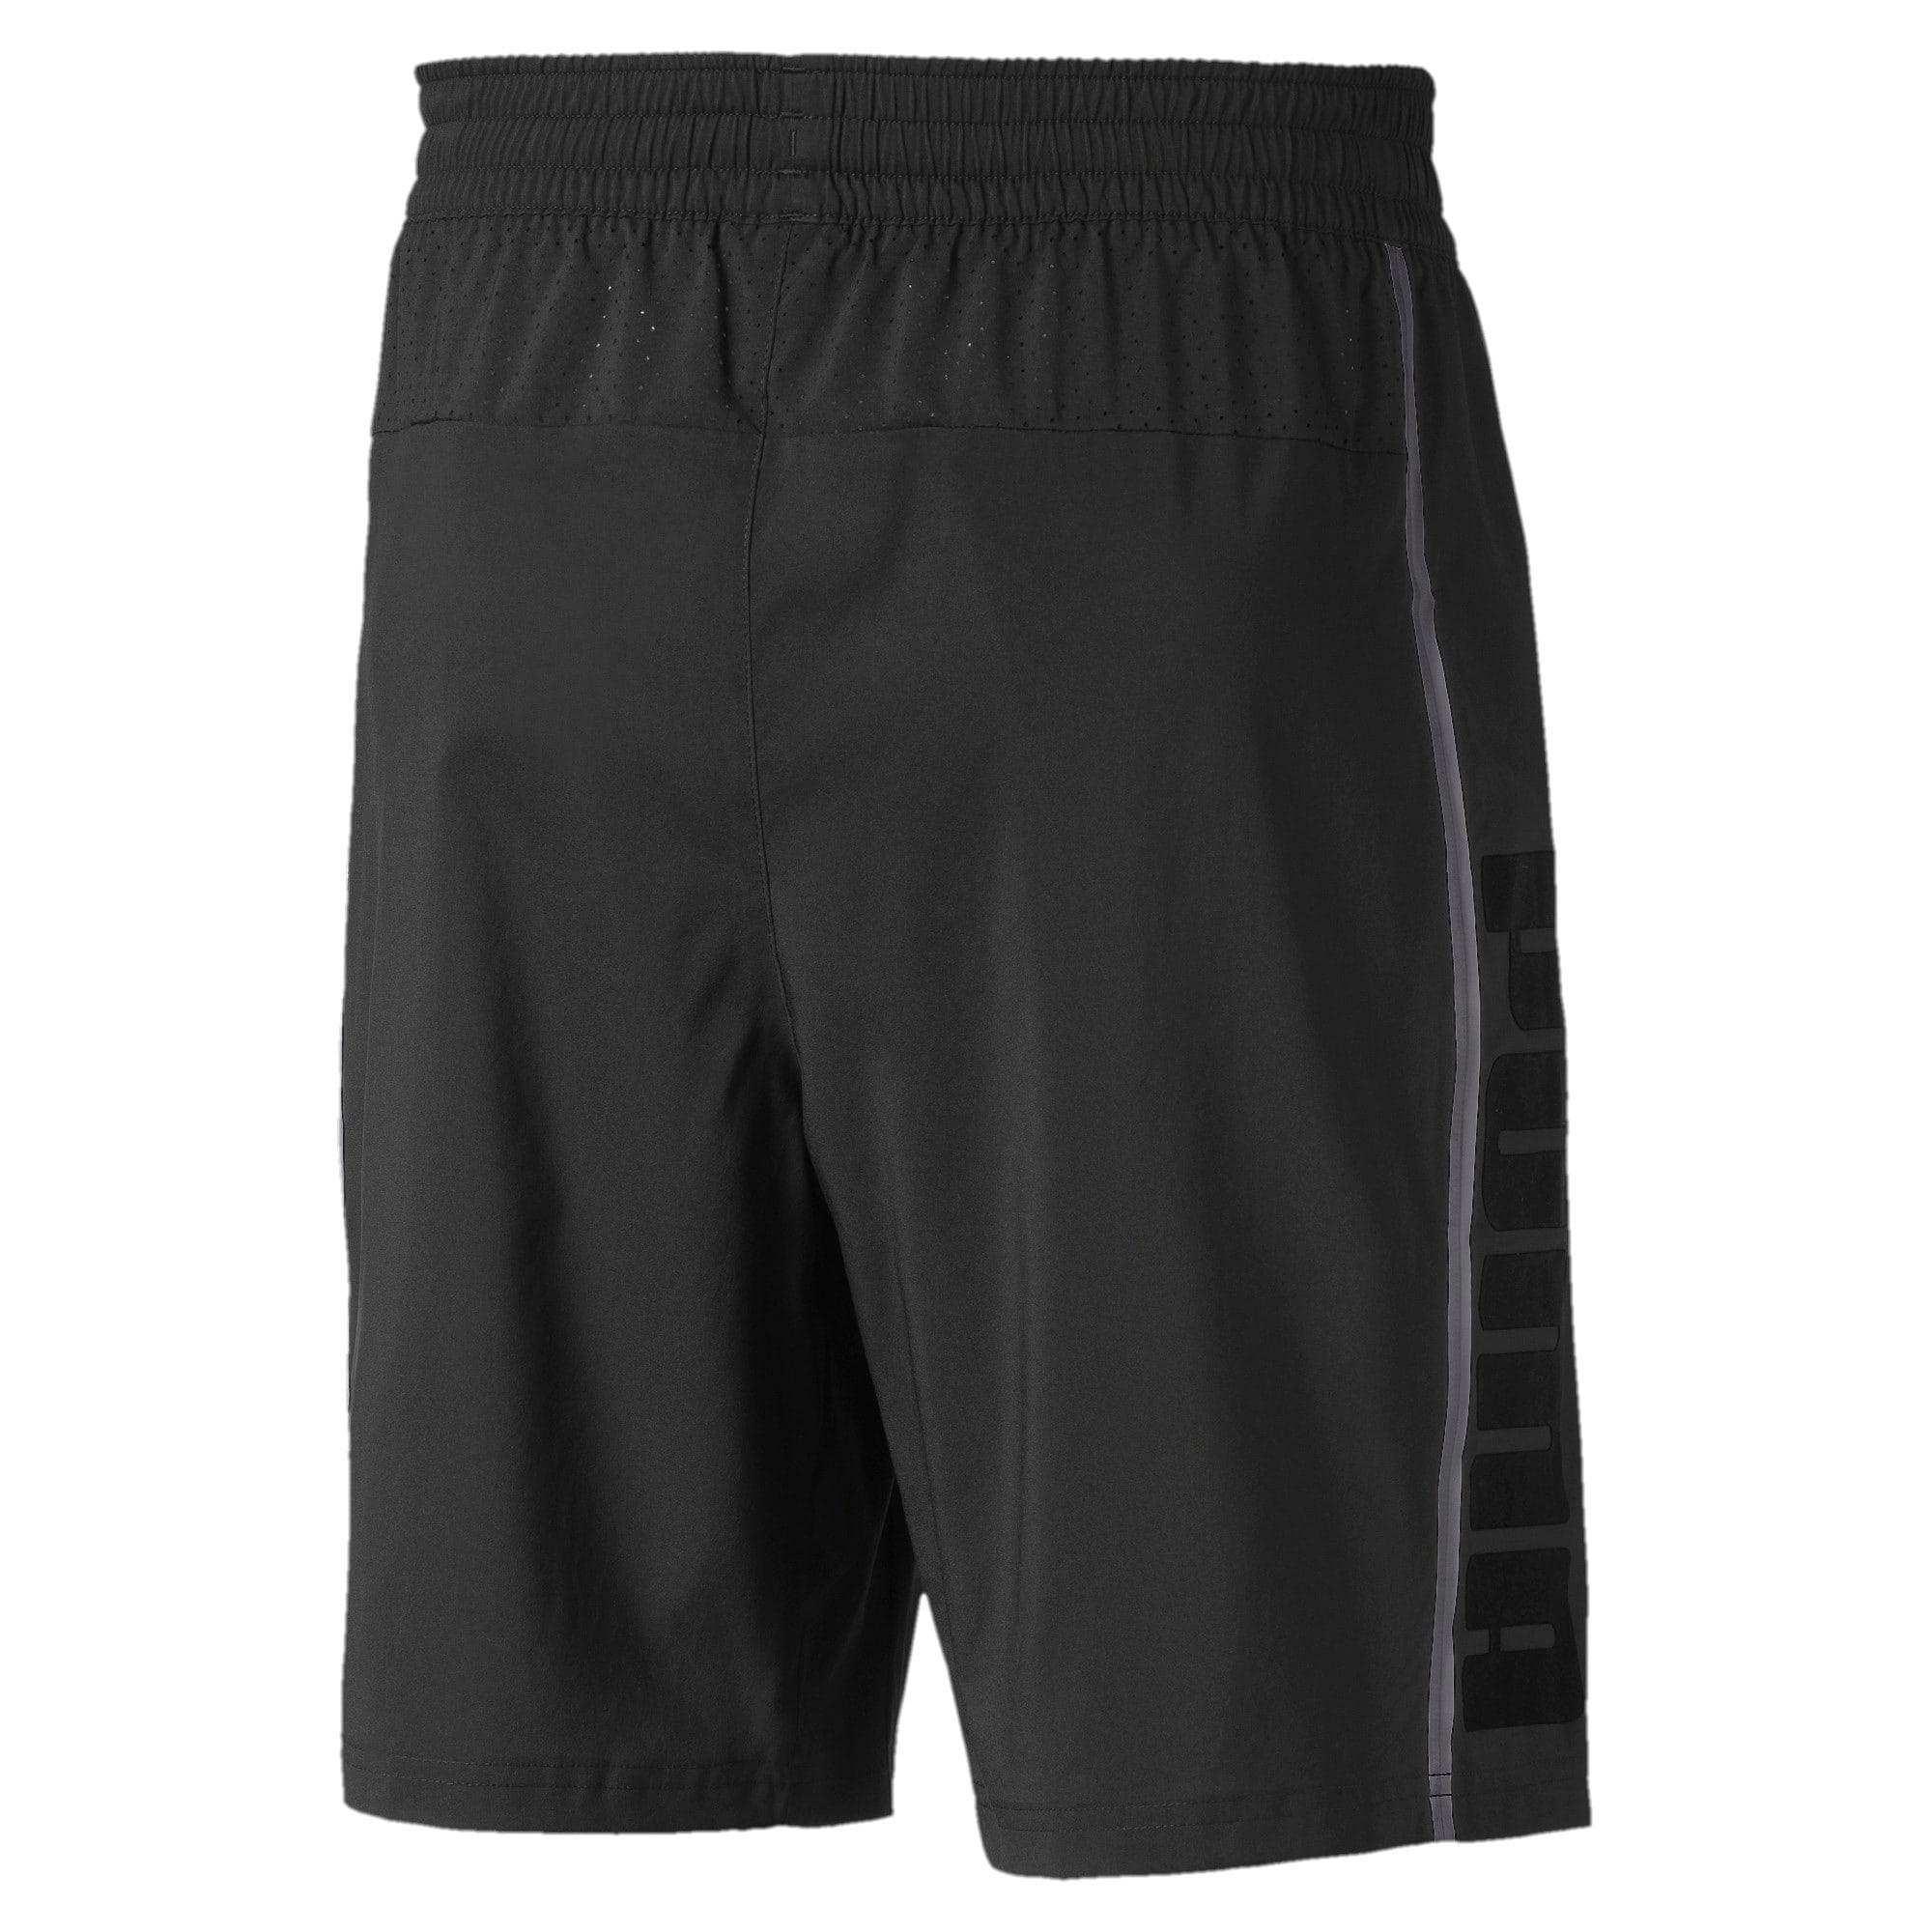 Thumbnail 5 of Power BND Men's Shorts, Puma Black, medium